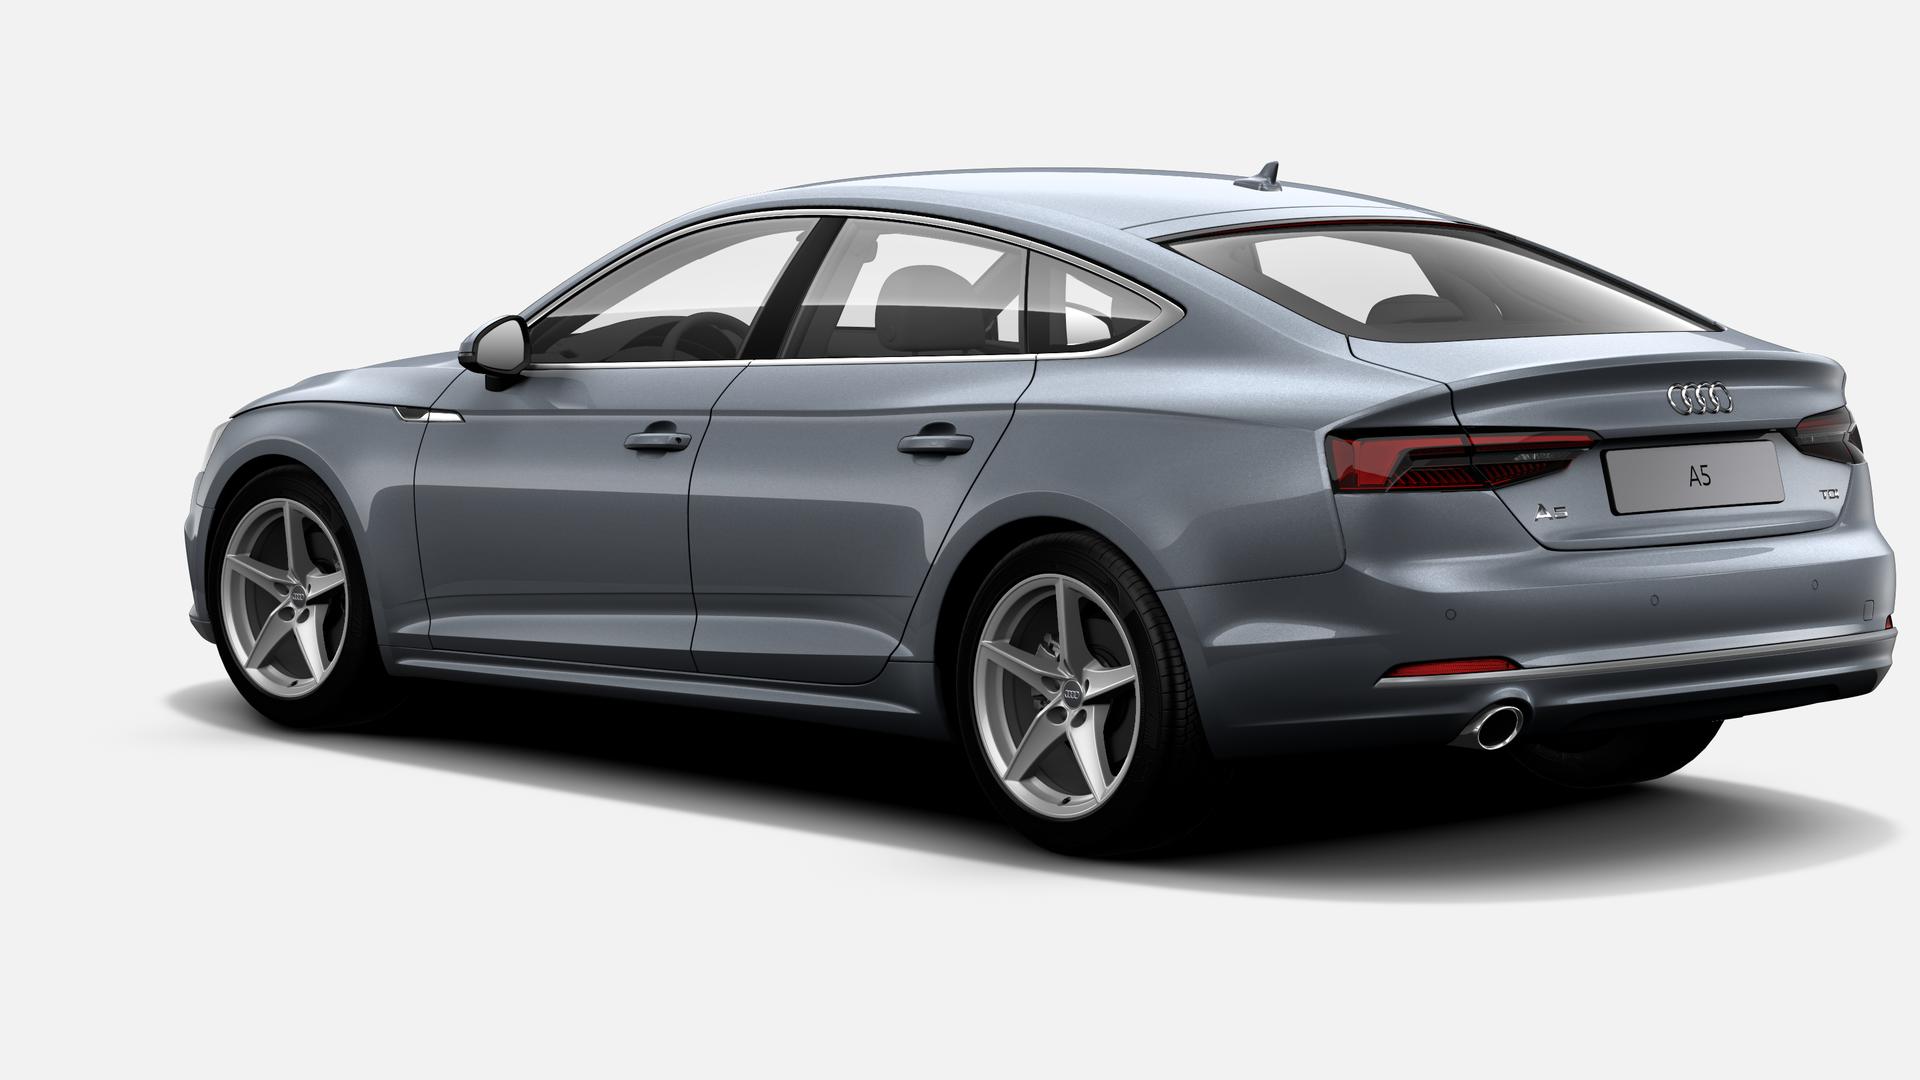 Vista Tres cuartos trasera izquierda de Audi A5 Sportback 2.0 TDI Sport S tronic 110 kW (150 CV)